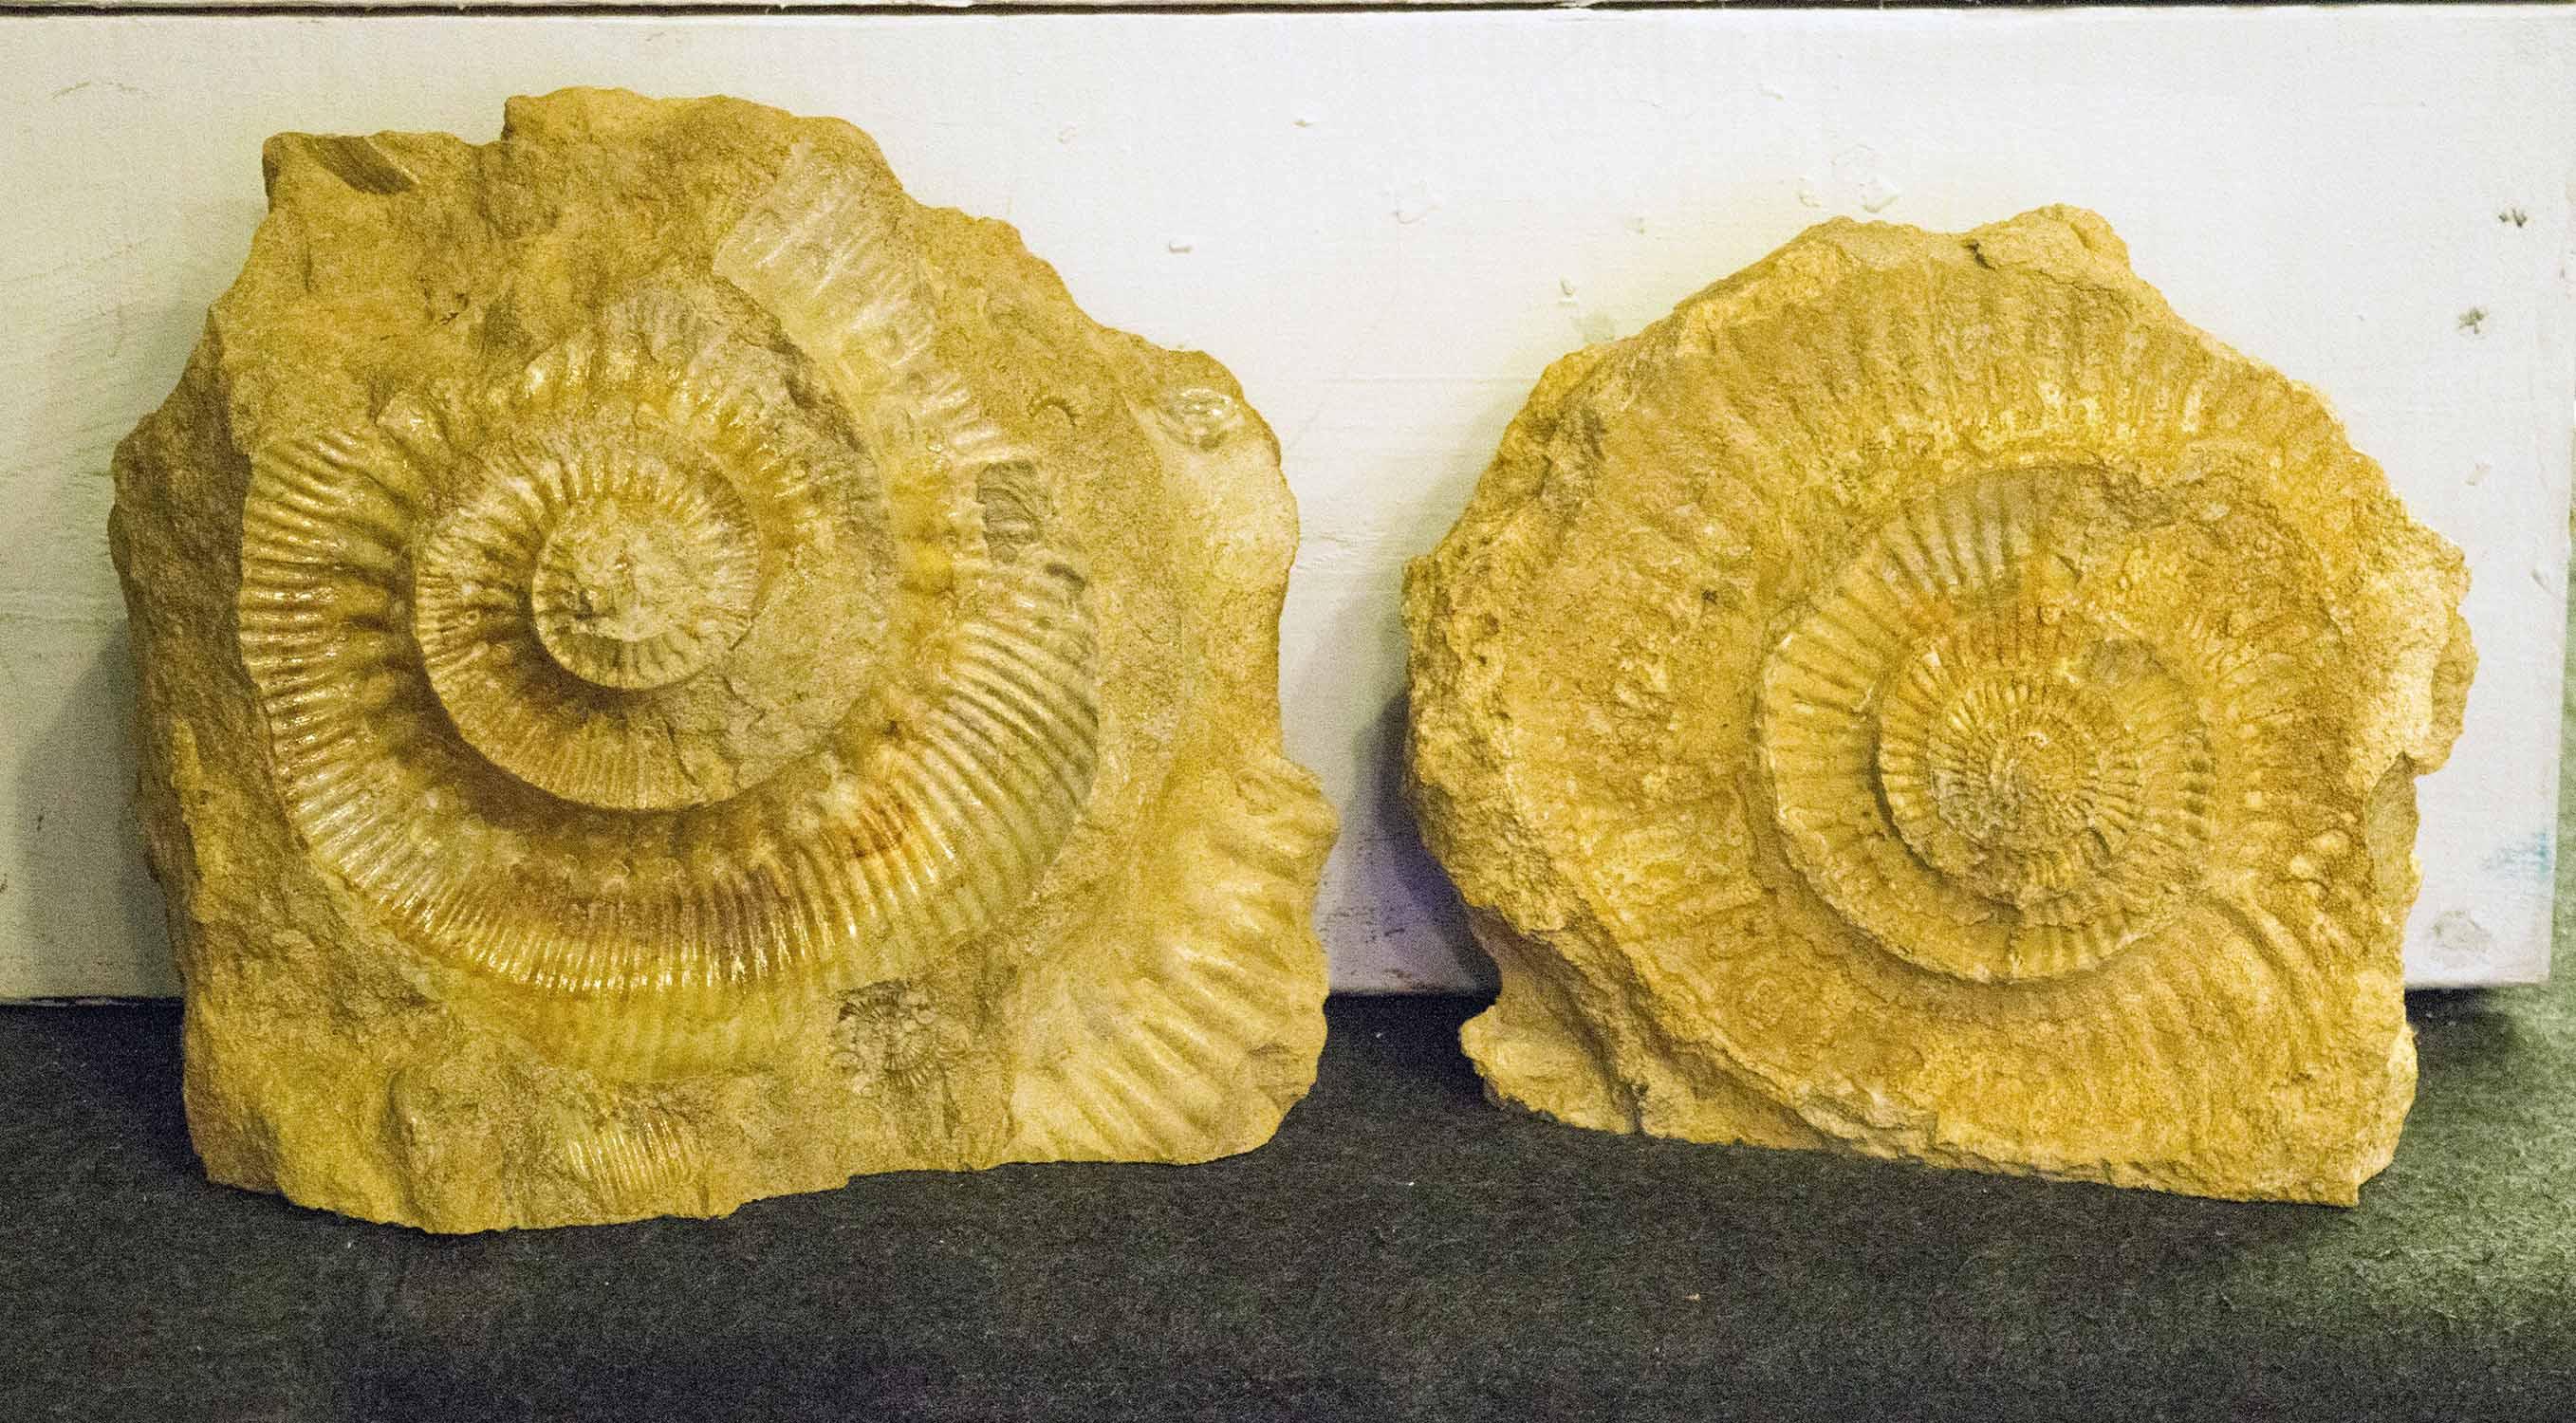 Lot 5 - AMMONITES STEPHANOCERAS HUMPHRIESIANUM, a pair, Jurassic era, Inferior Oolite, circa 170 million,